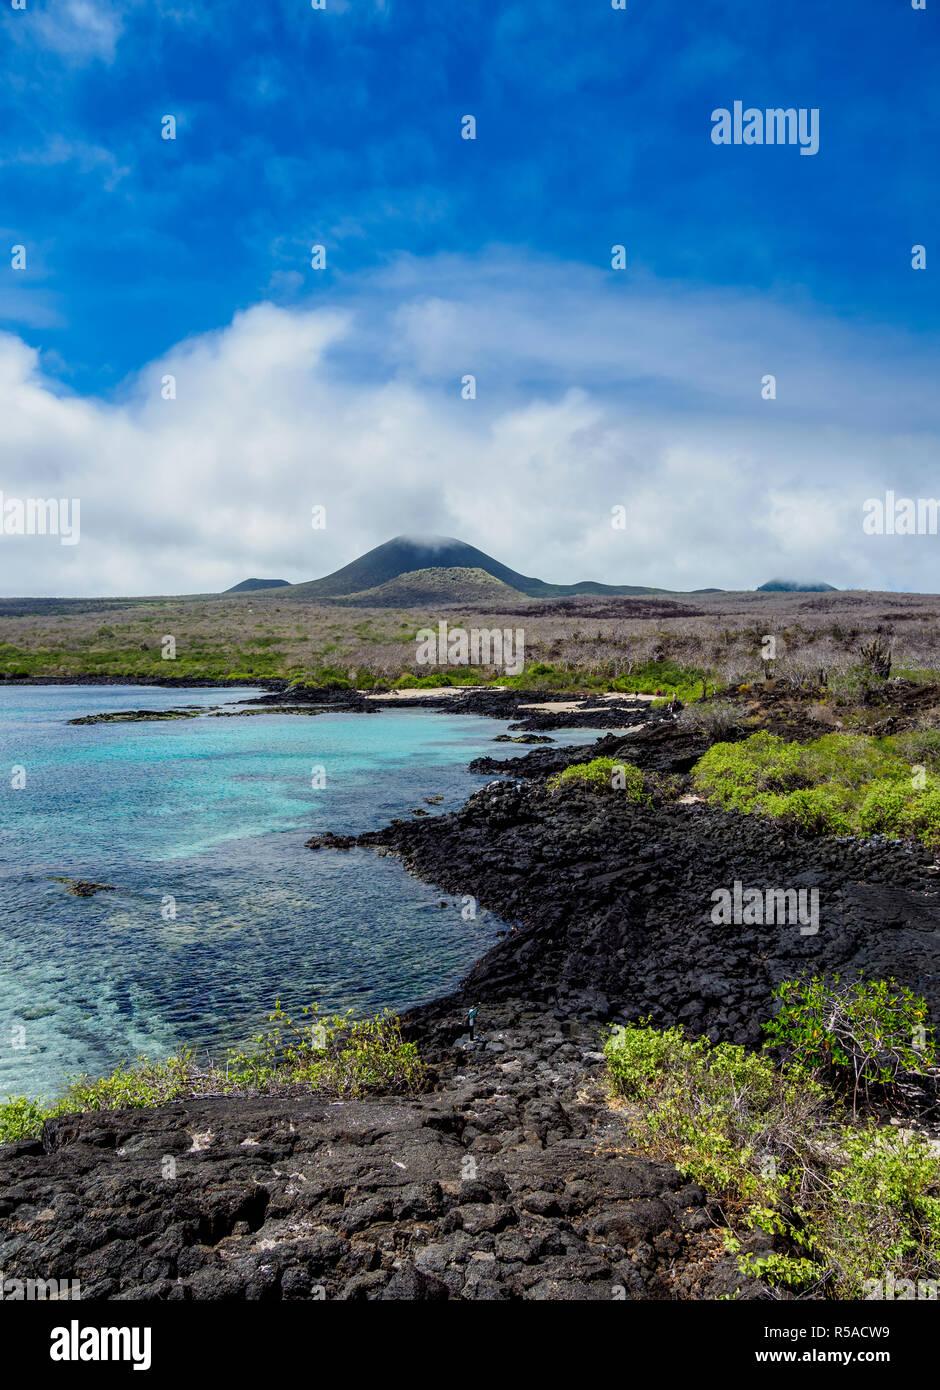 Volcanic coast, near Puerto Velazco Ibarra, Floreana or Charles Island, Galapagos, Ecuador - Stock Image